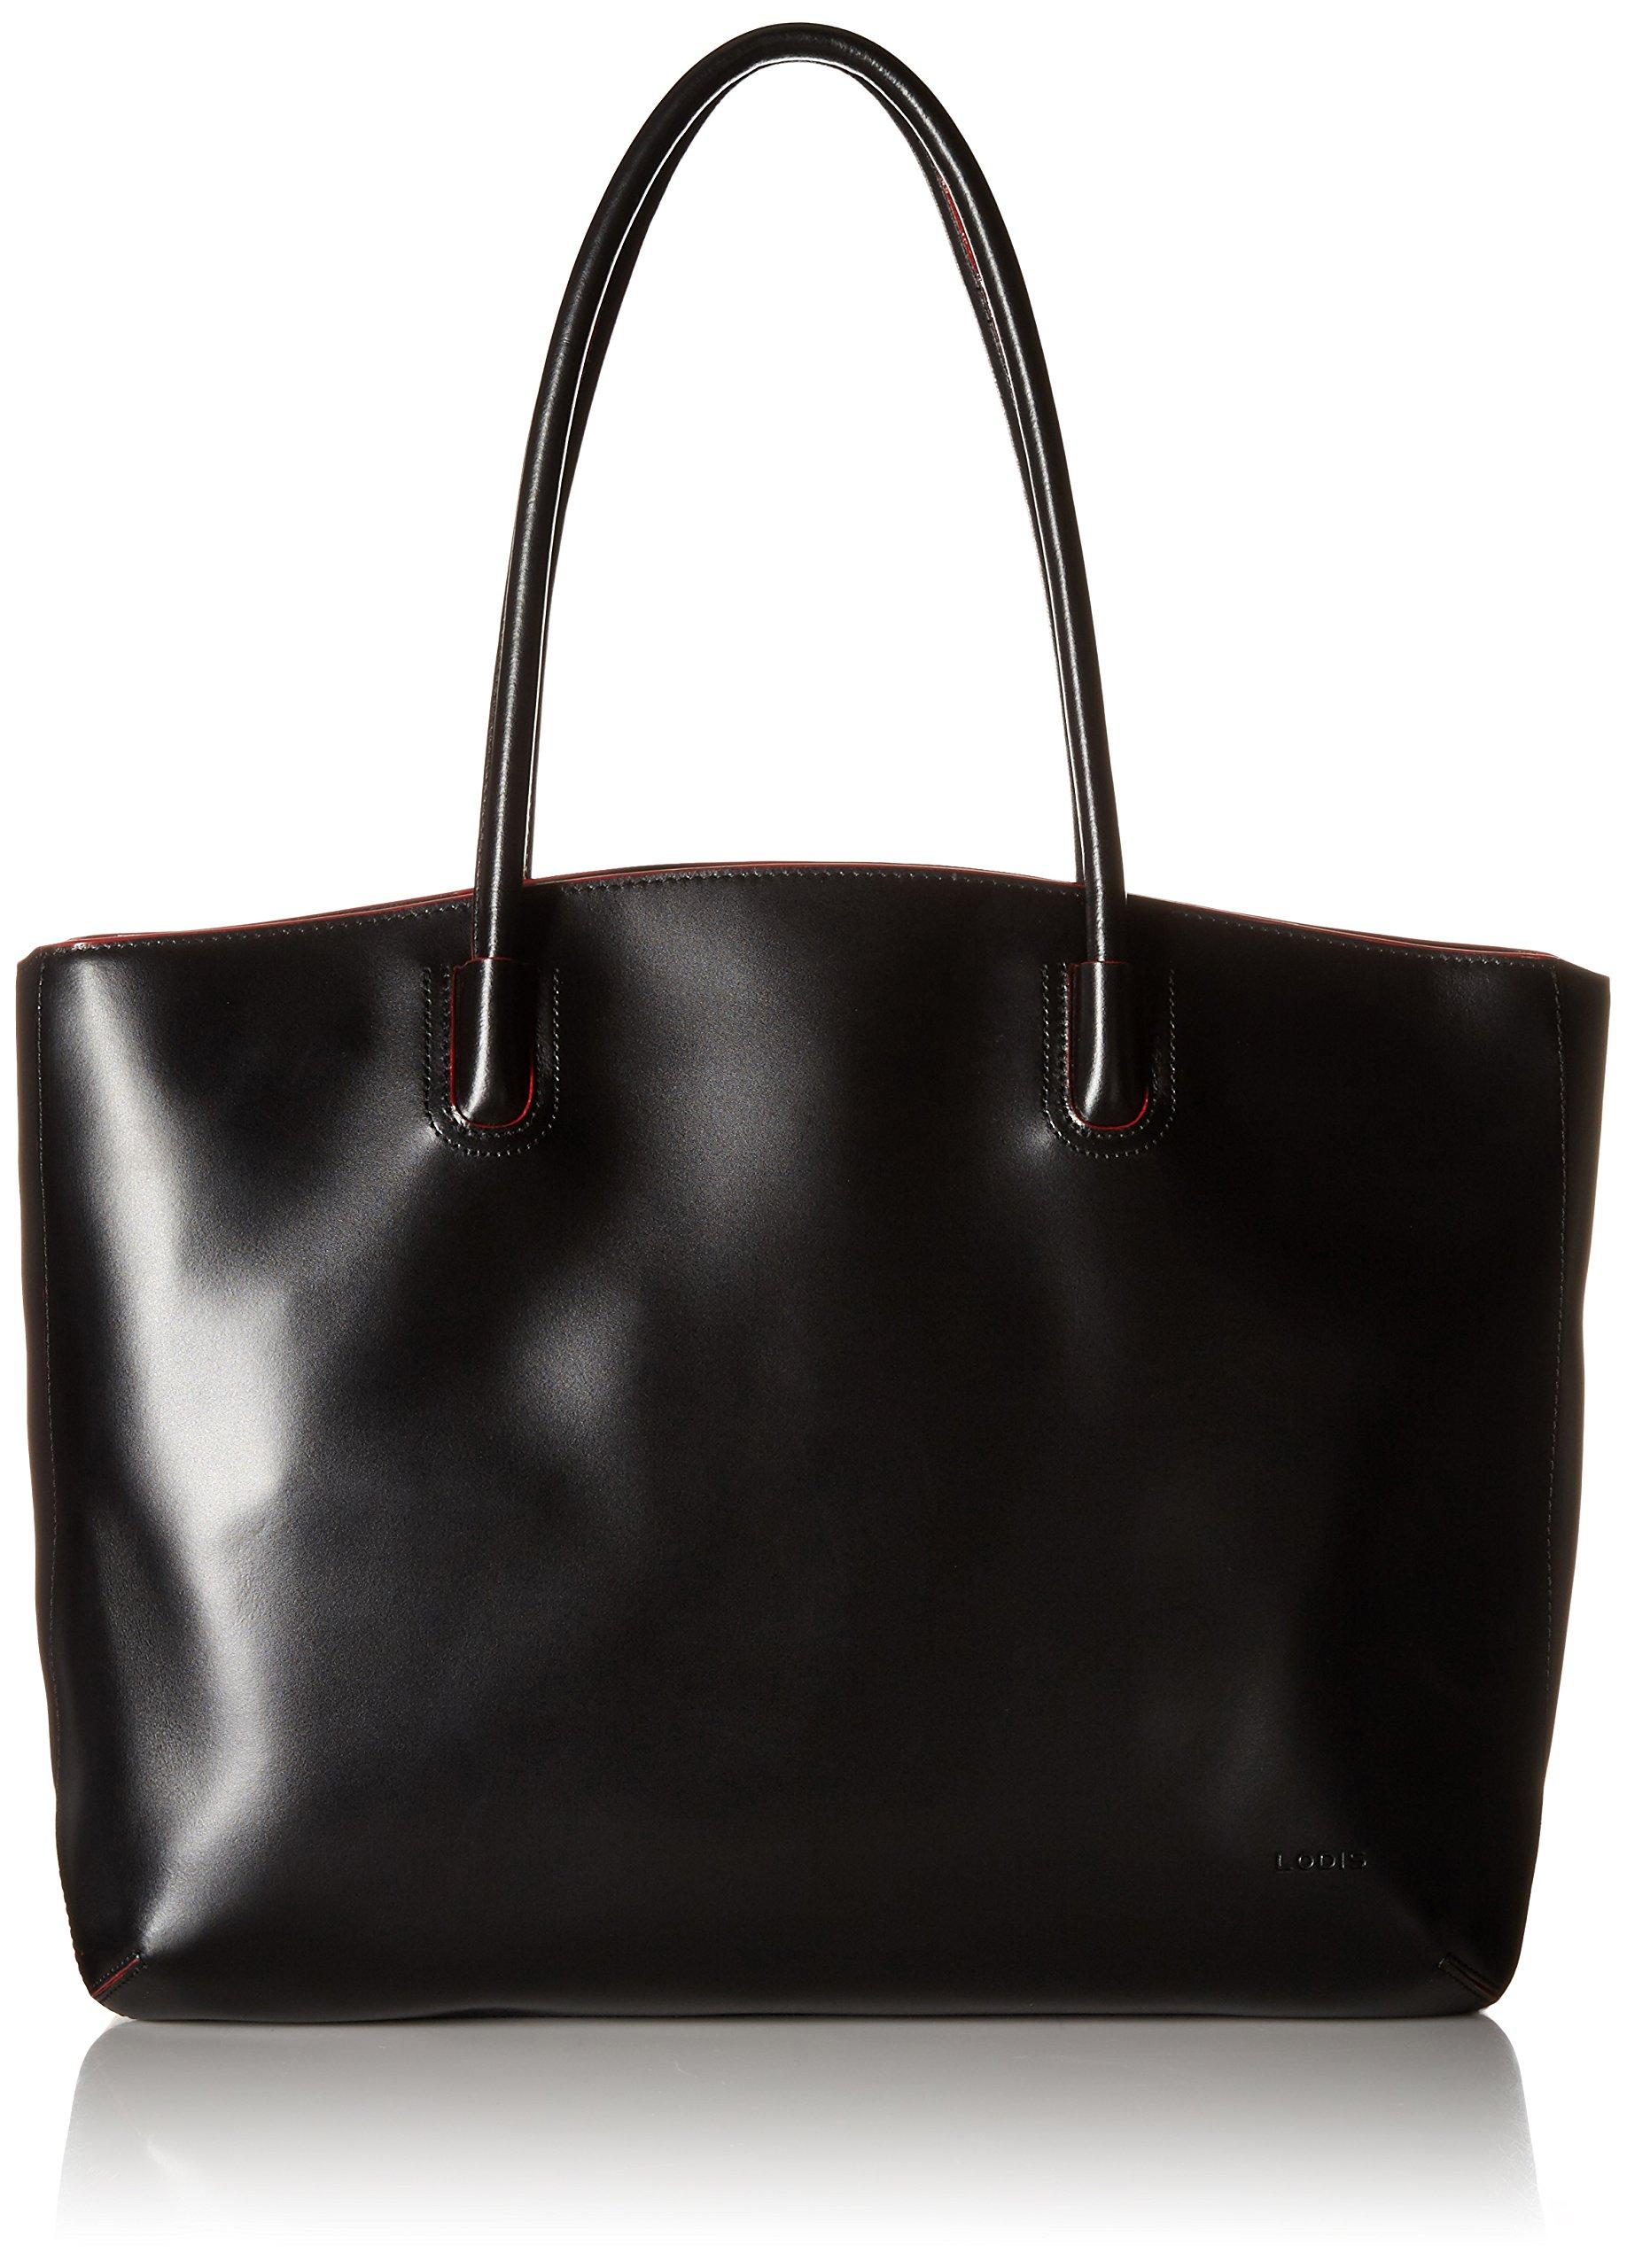 Lodis Audrey Milano Tote,Black,one size